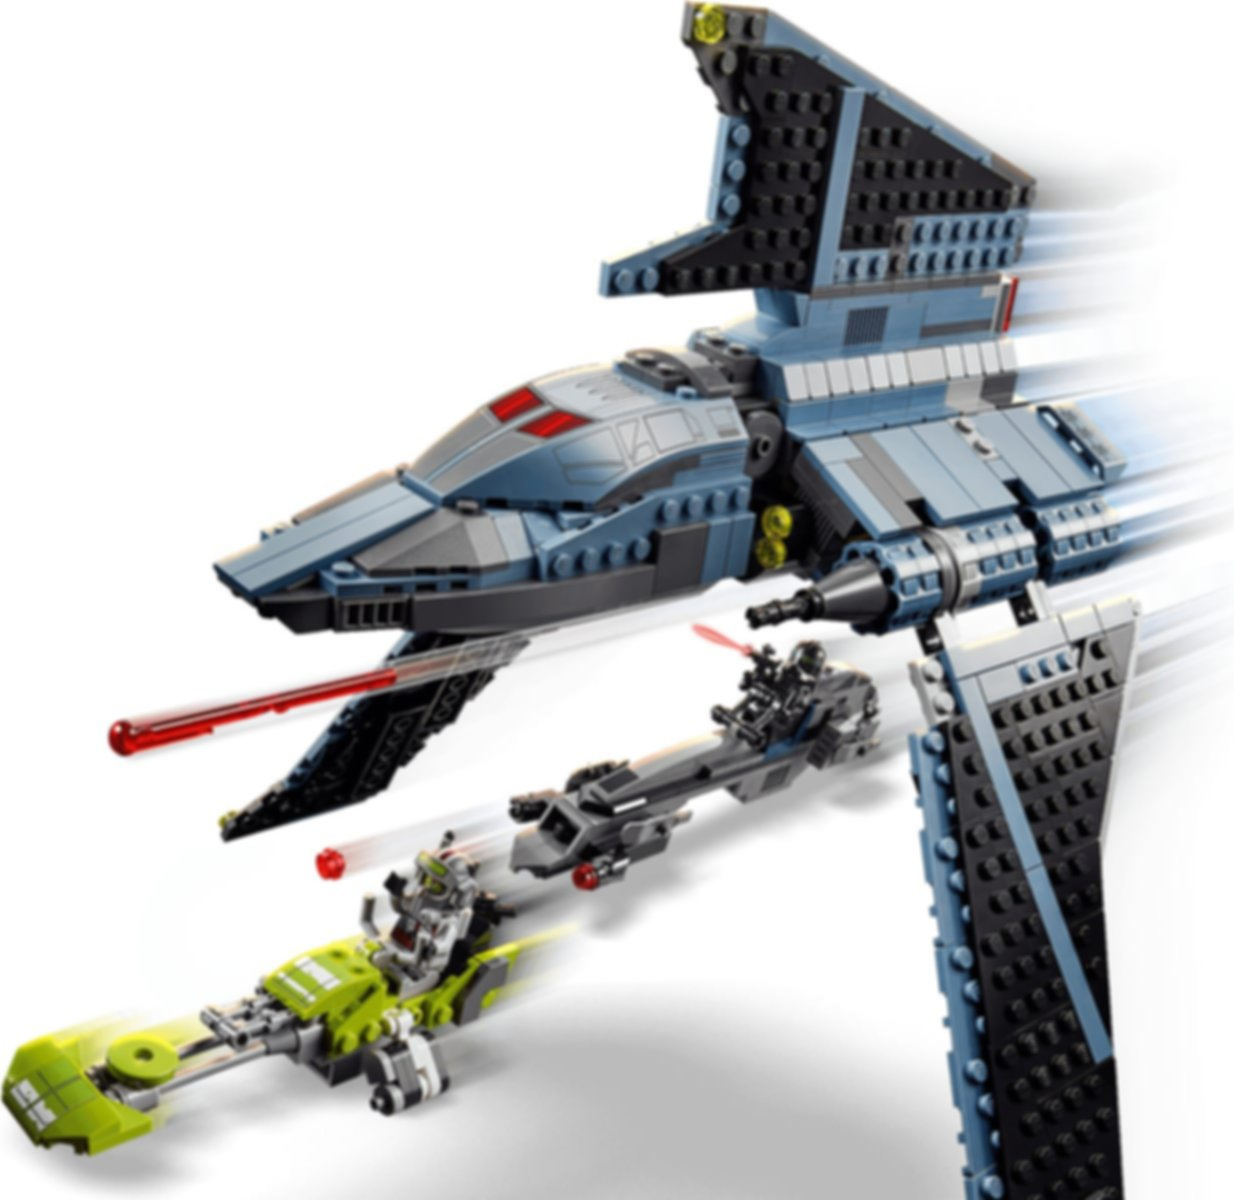 LEGO® Star Wars The Bad Batch™ Attack Shuttle gameplay